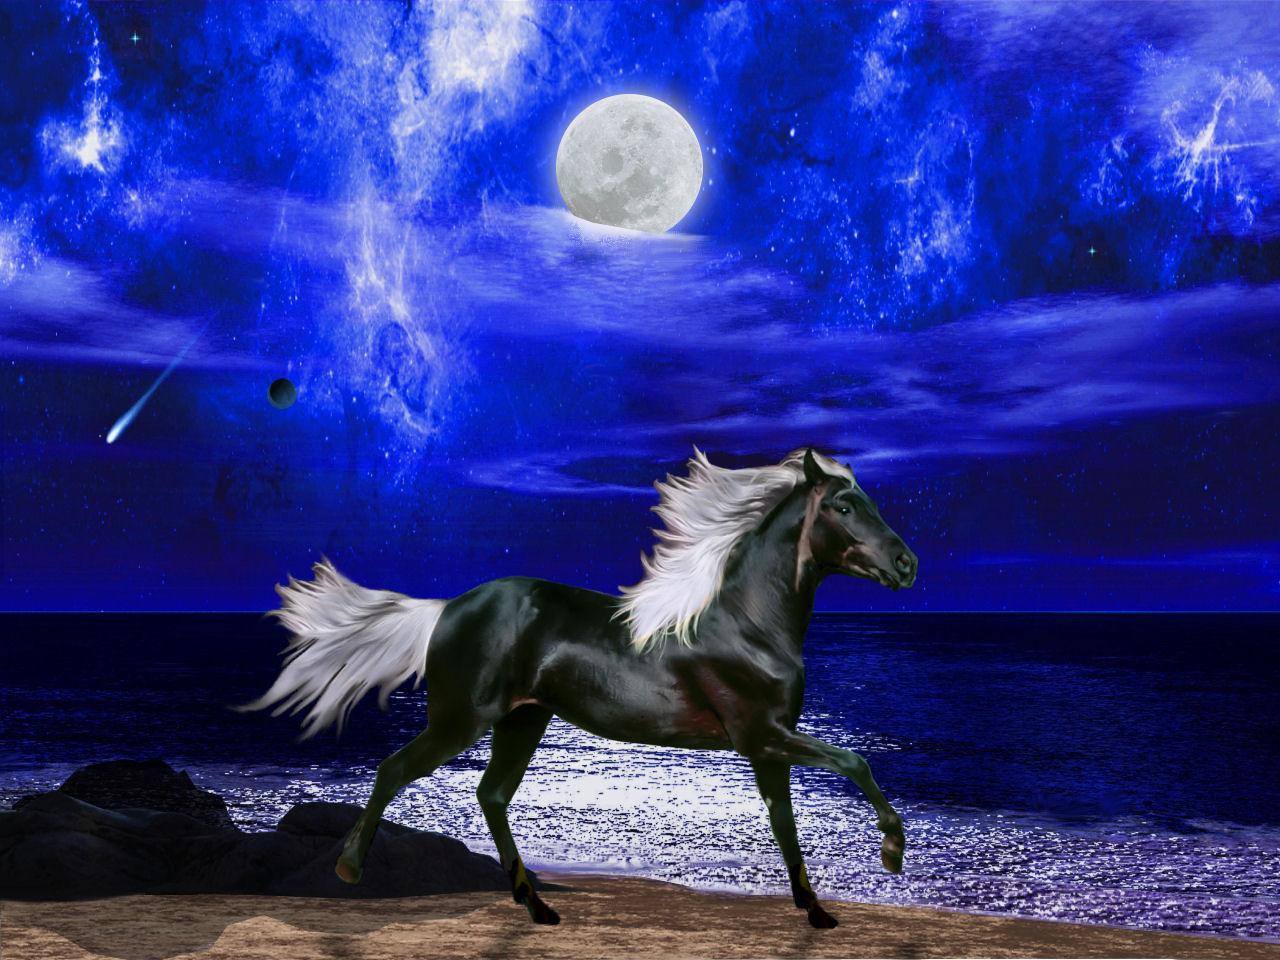 048 koně zvířata horses animals